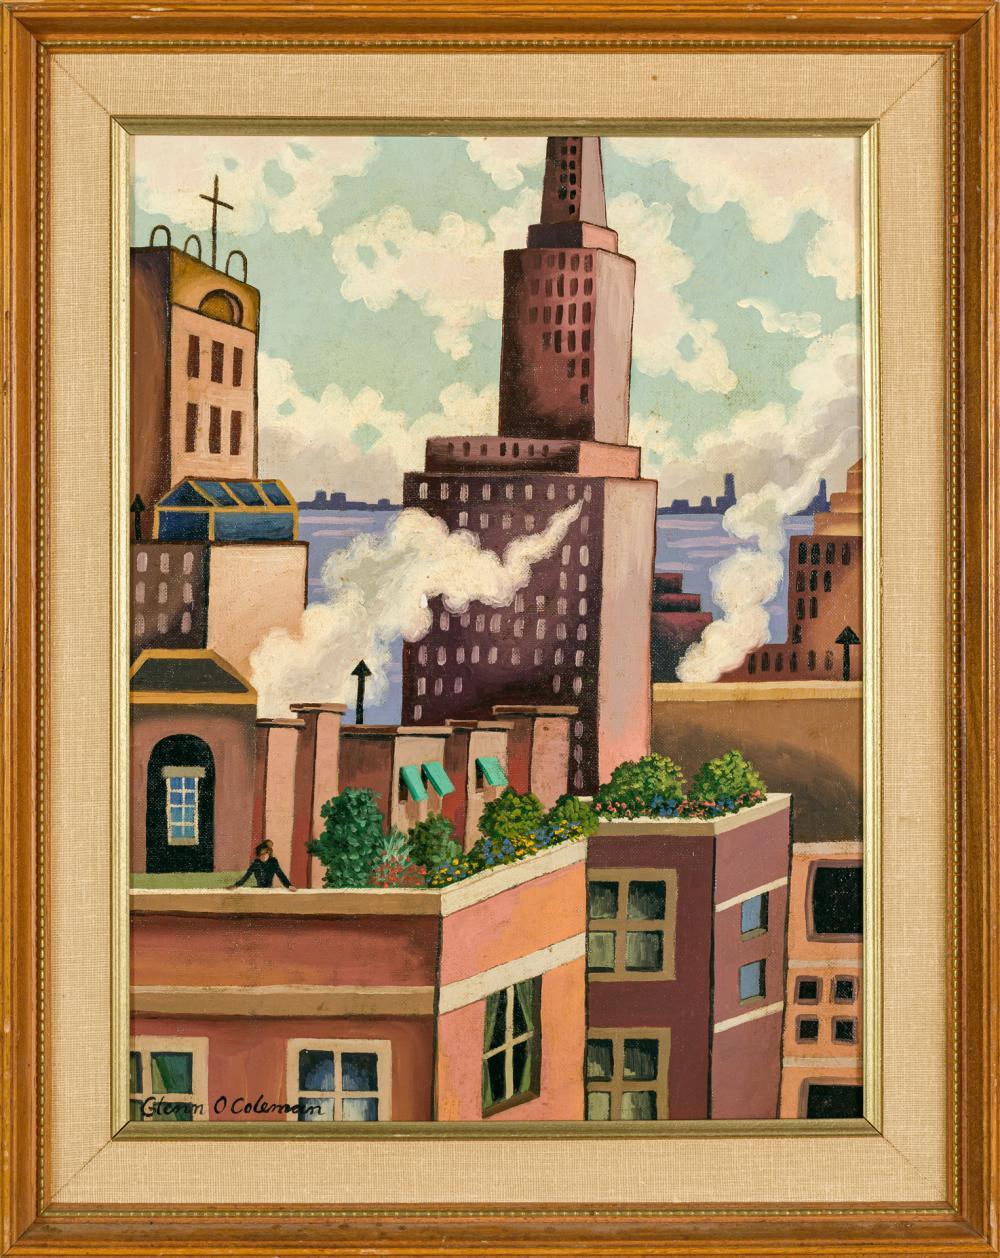 "GLENN O. COLEMAN, American (1887-1932), Manhattan Rooftops, oil on canvasboard, signed lower left ""Glenn O. Coleman"", 16 x 12 inches"